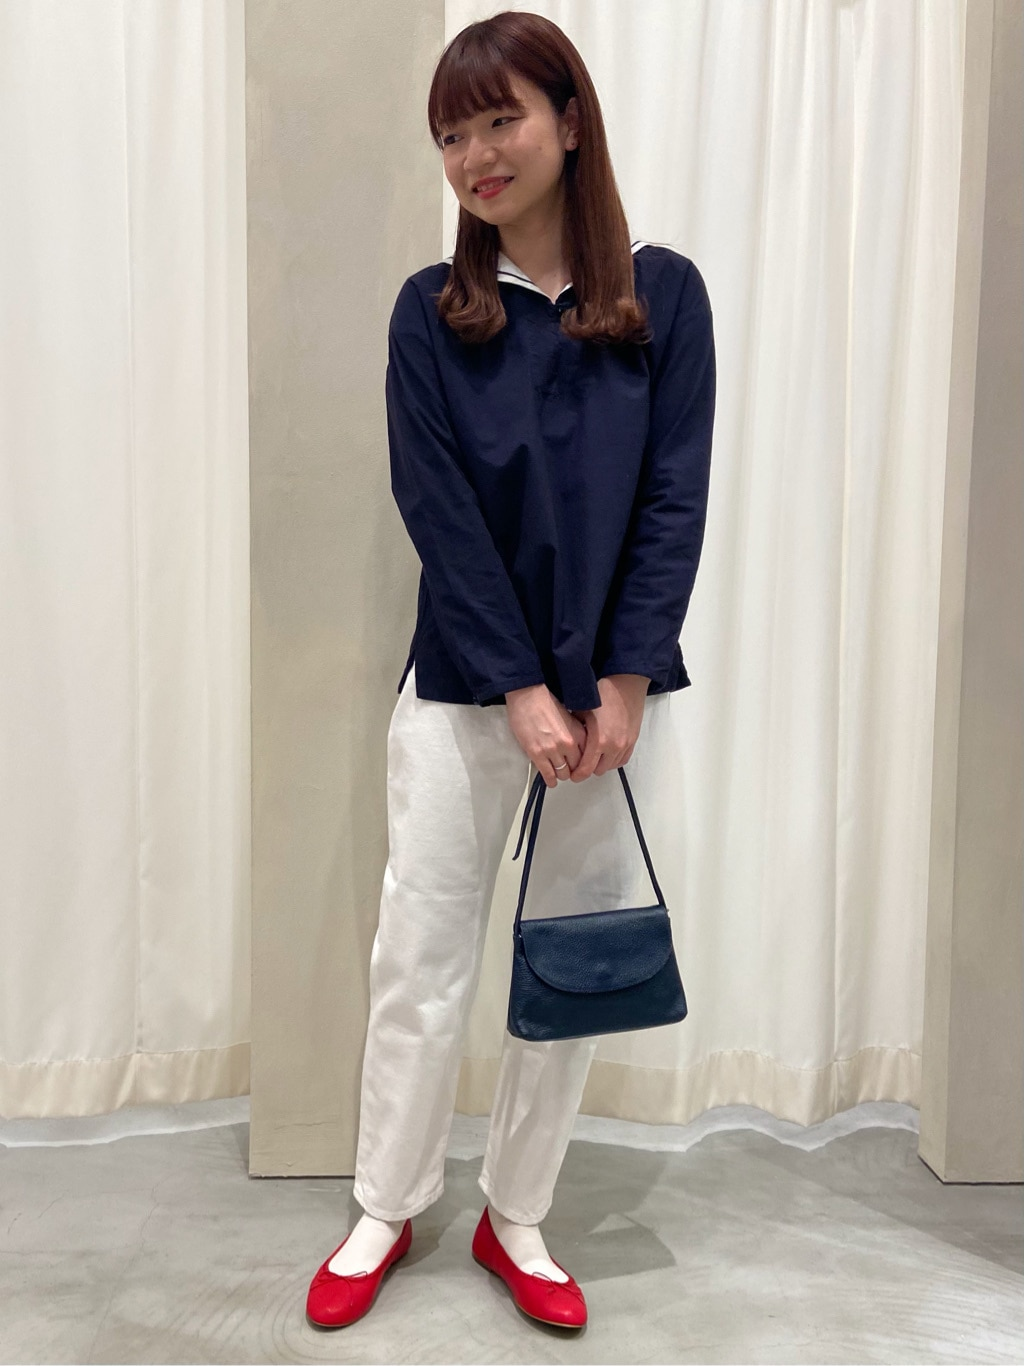 - CHILD WOMAN CHILD WOMAN , PAR ICI 東京スカイツリータウン・ソラマチ 身長:165cm 2021.02.04